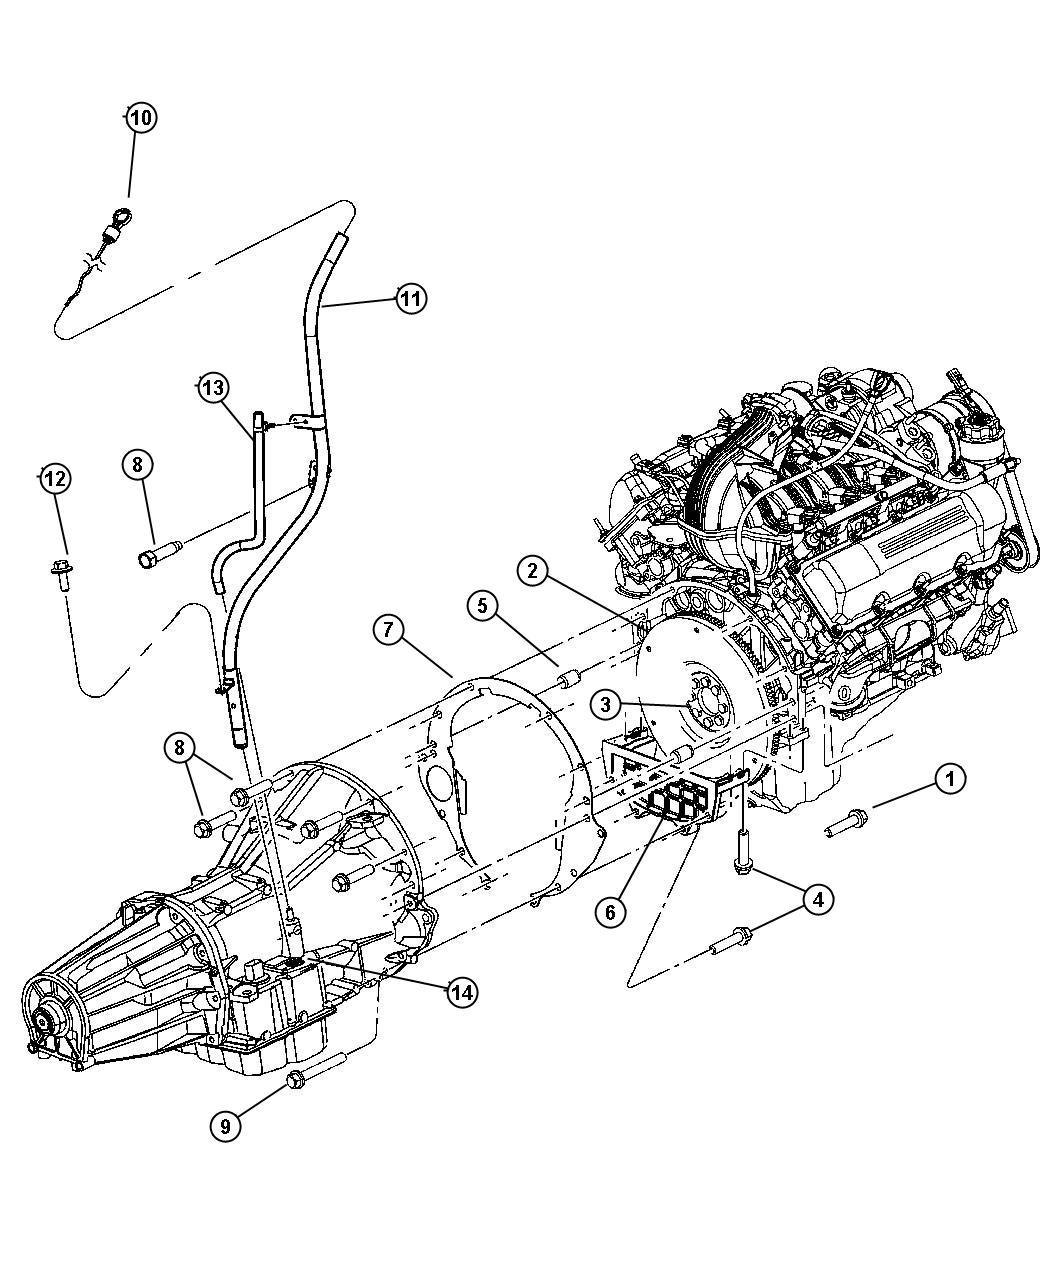 2008 dodge nitro engine diagram pedestal fan wiring 2007 window schematic transmission diagrams best library 00i81094 03